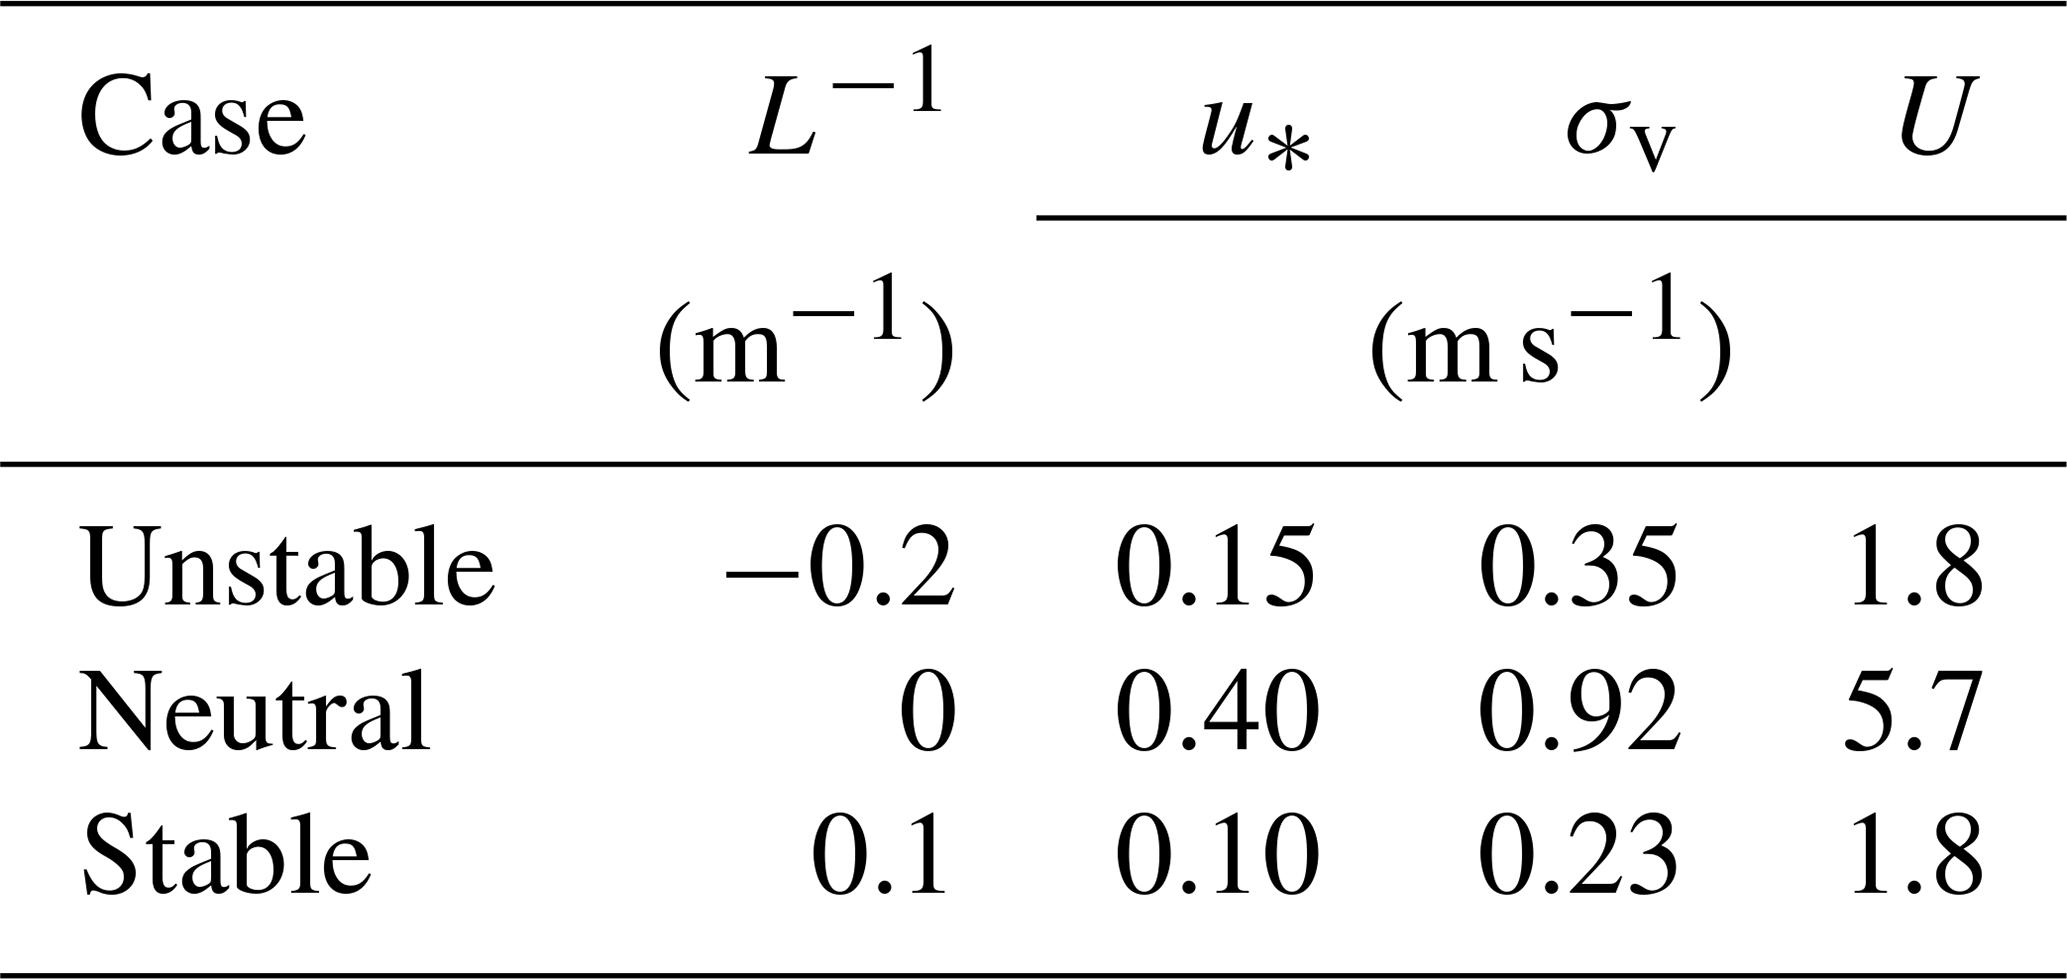 BG - Interpreting eddy covariance data from heterogeneous